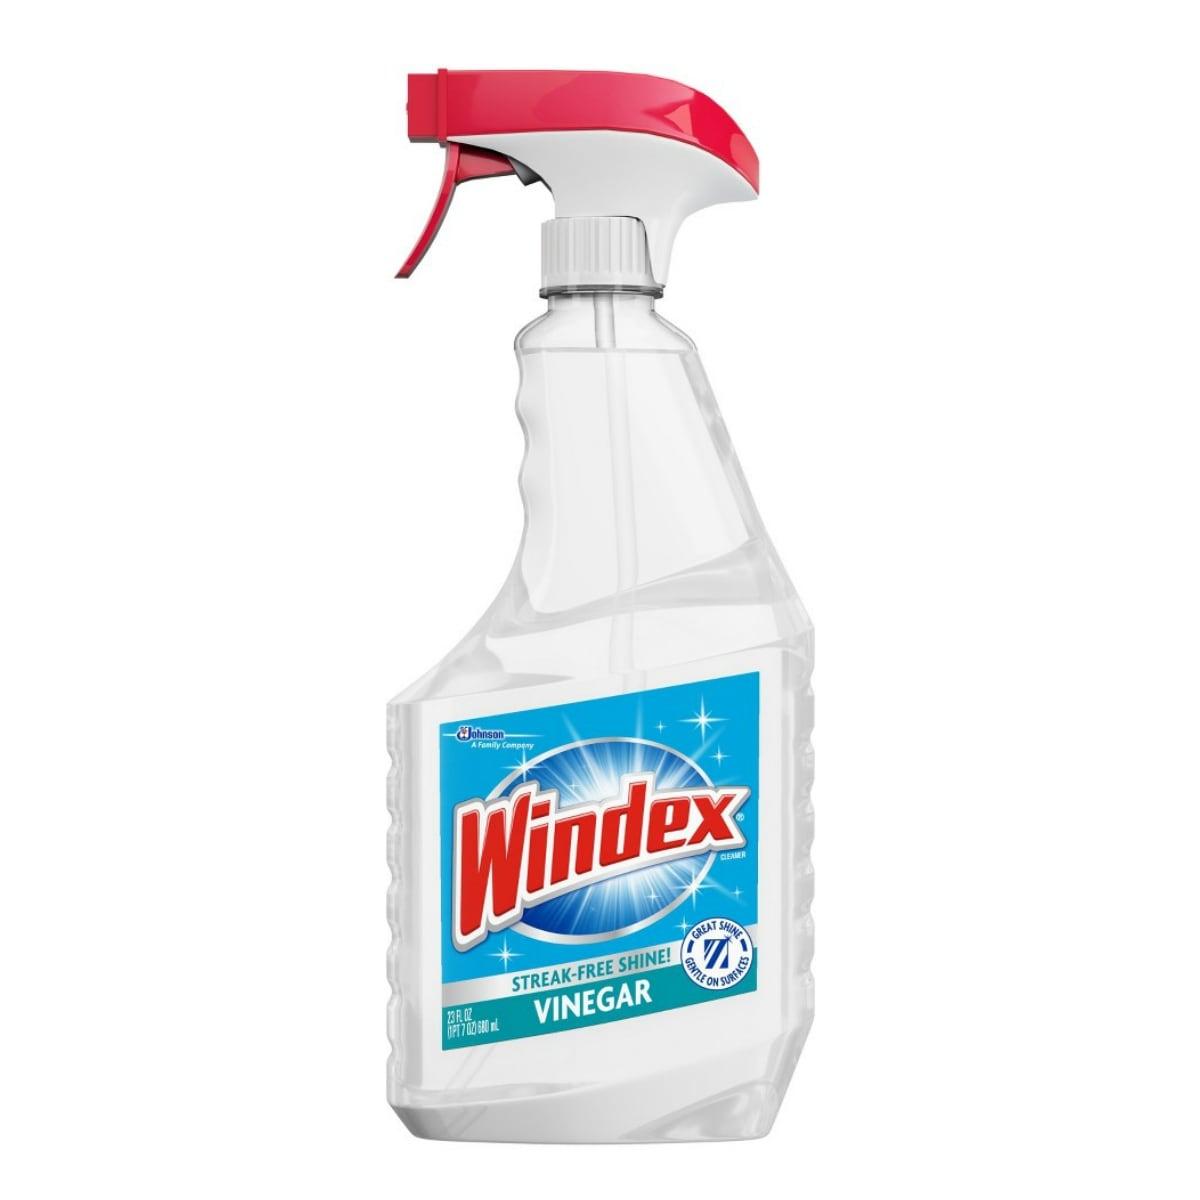 Windex 70331 Vinegar Multi-Surface Cleaner, 26 Oz, Clear - Thumbnail 0